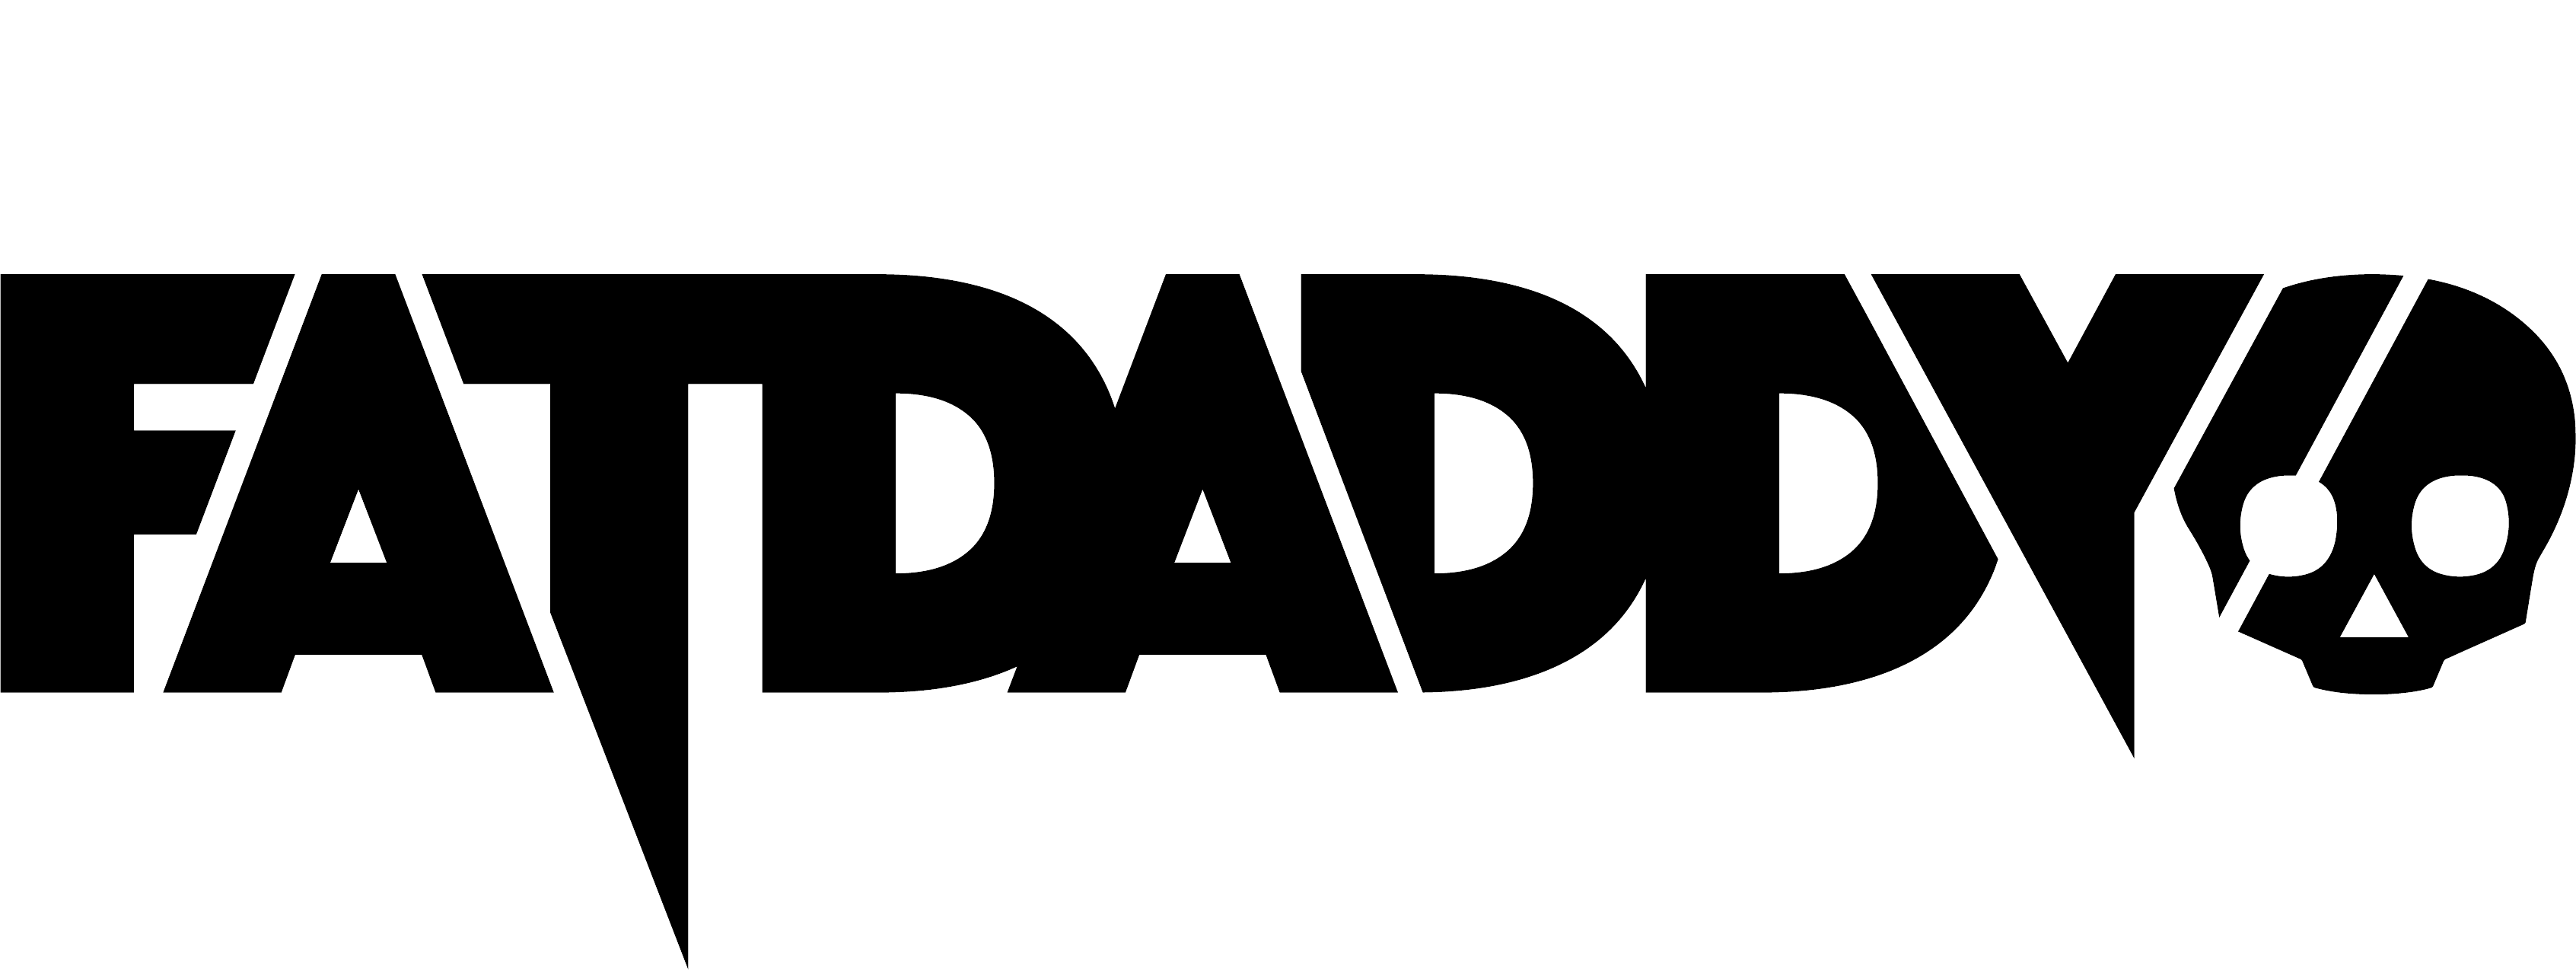 Fatdaddy Danmark